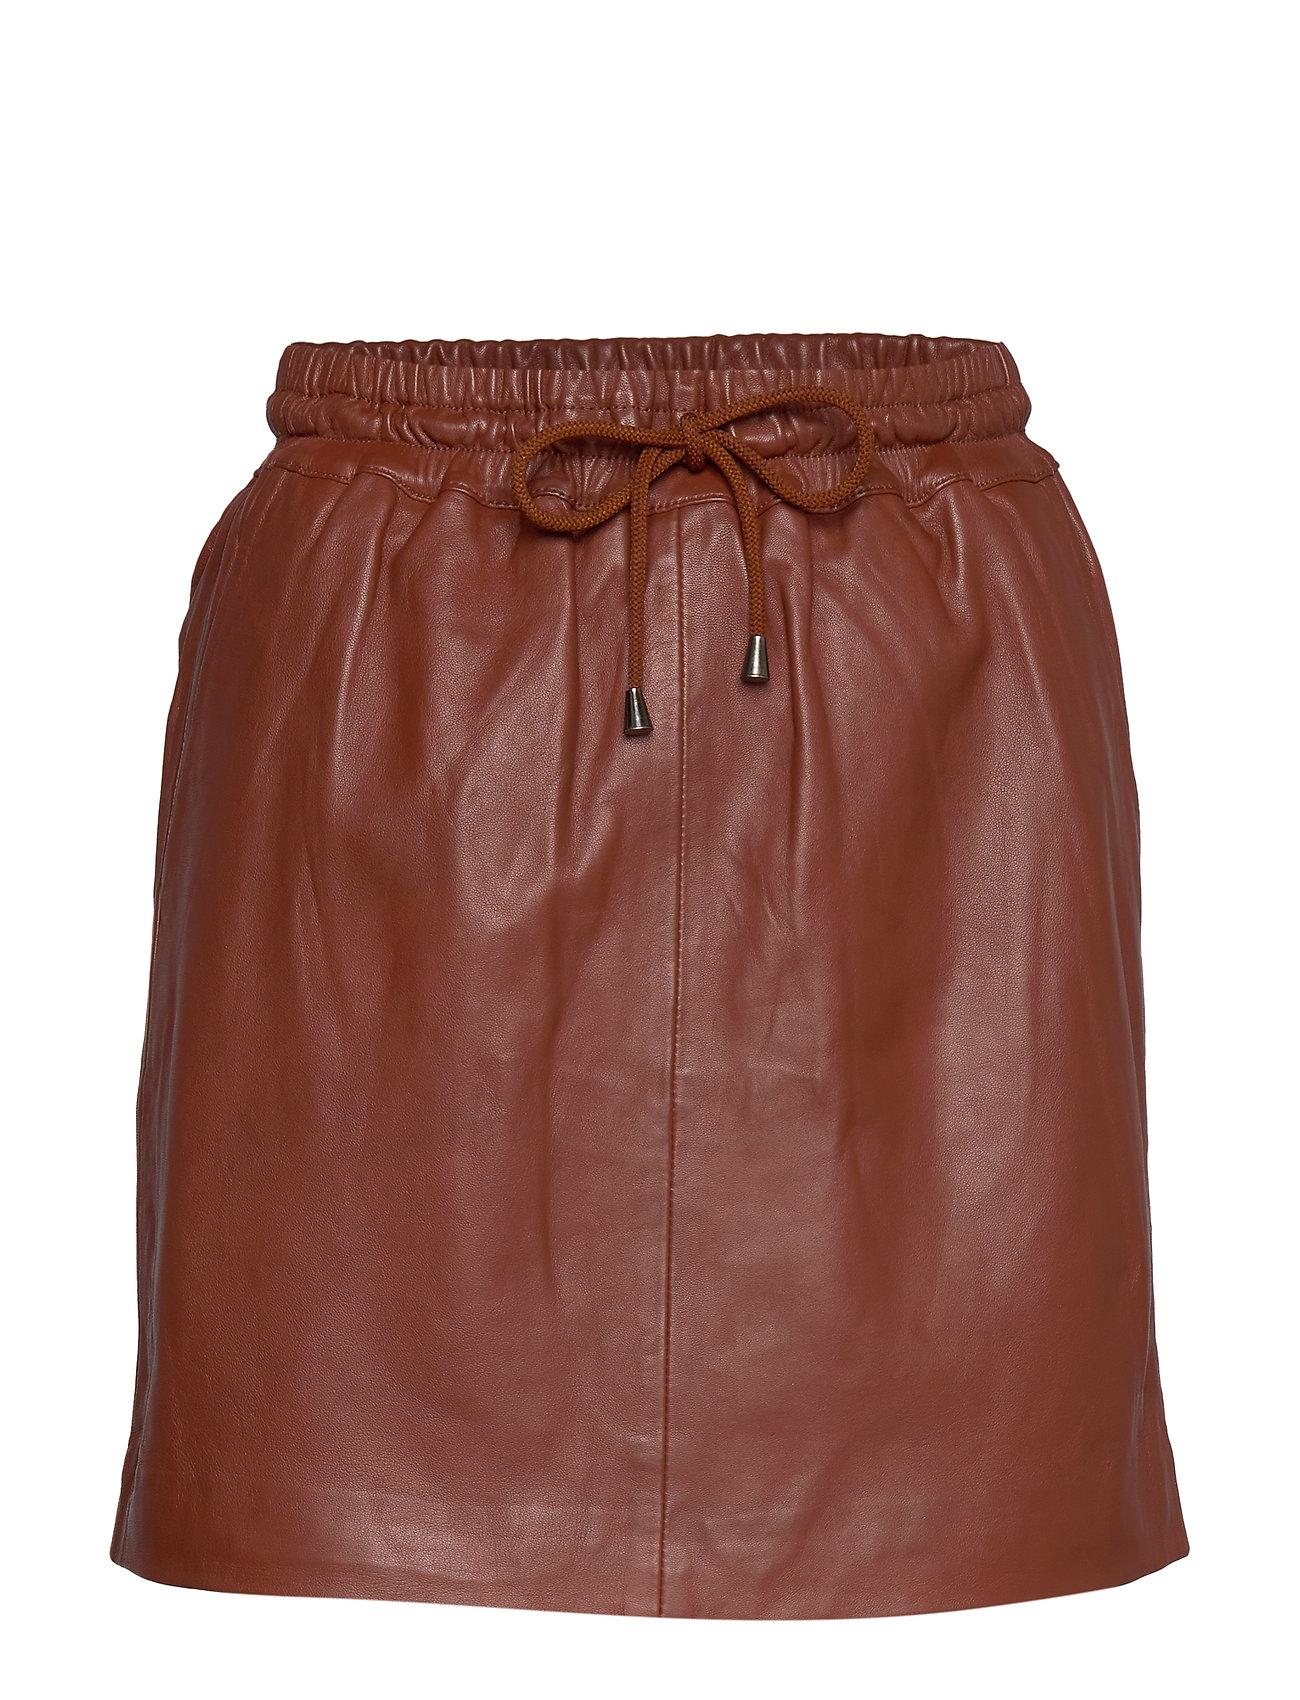 DEPECHE Skirt with smock waist - SMOKED PAPRIKA